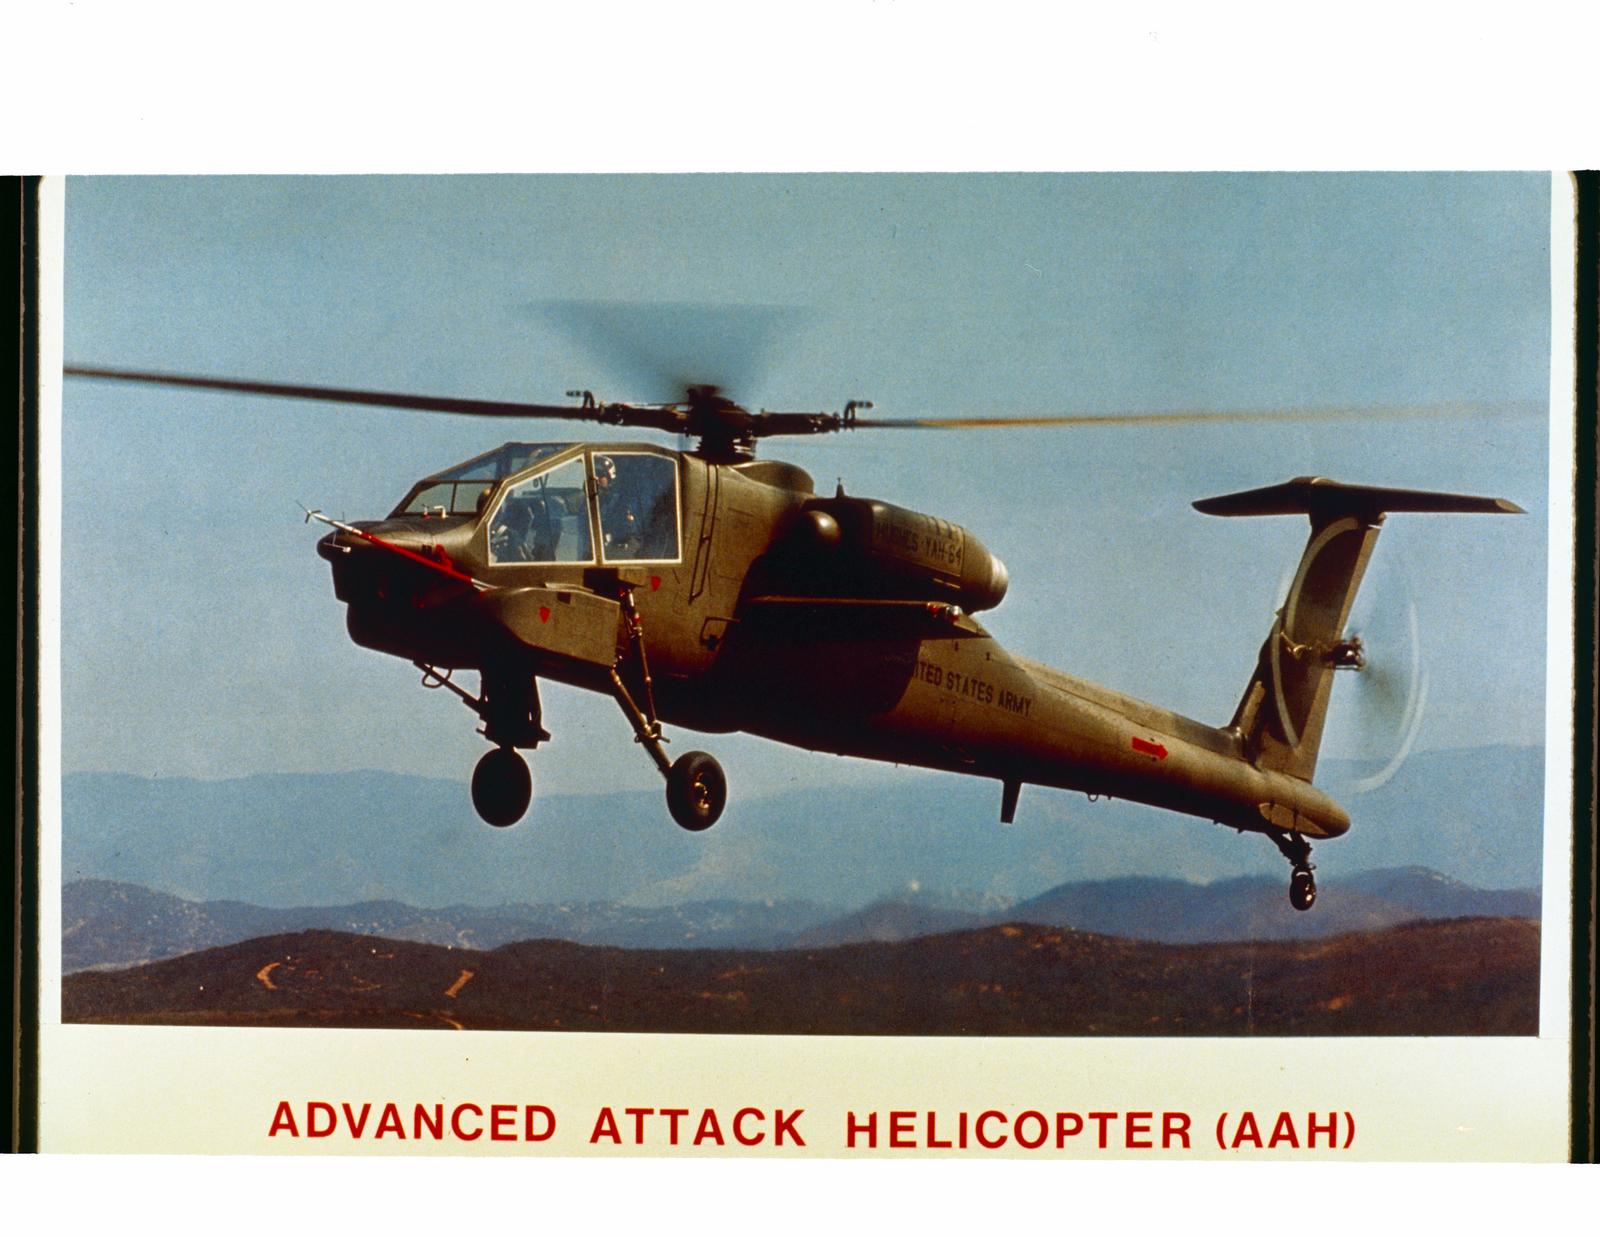 T-700 ENGINE - AAH AND UTTAS